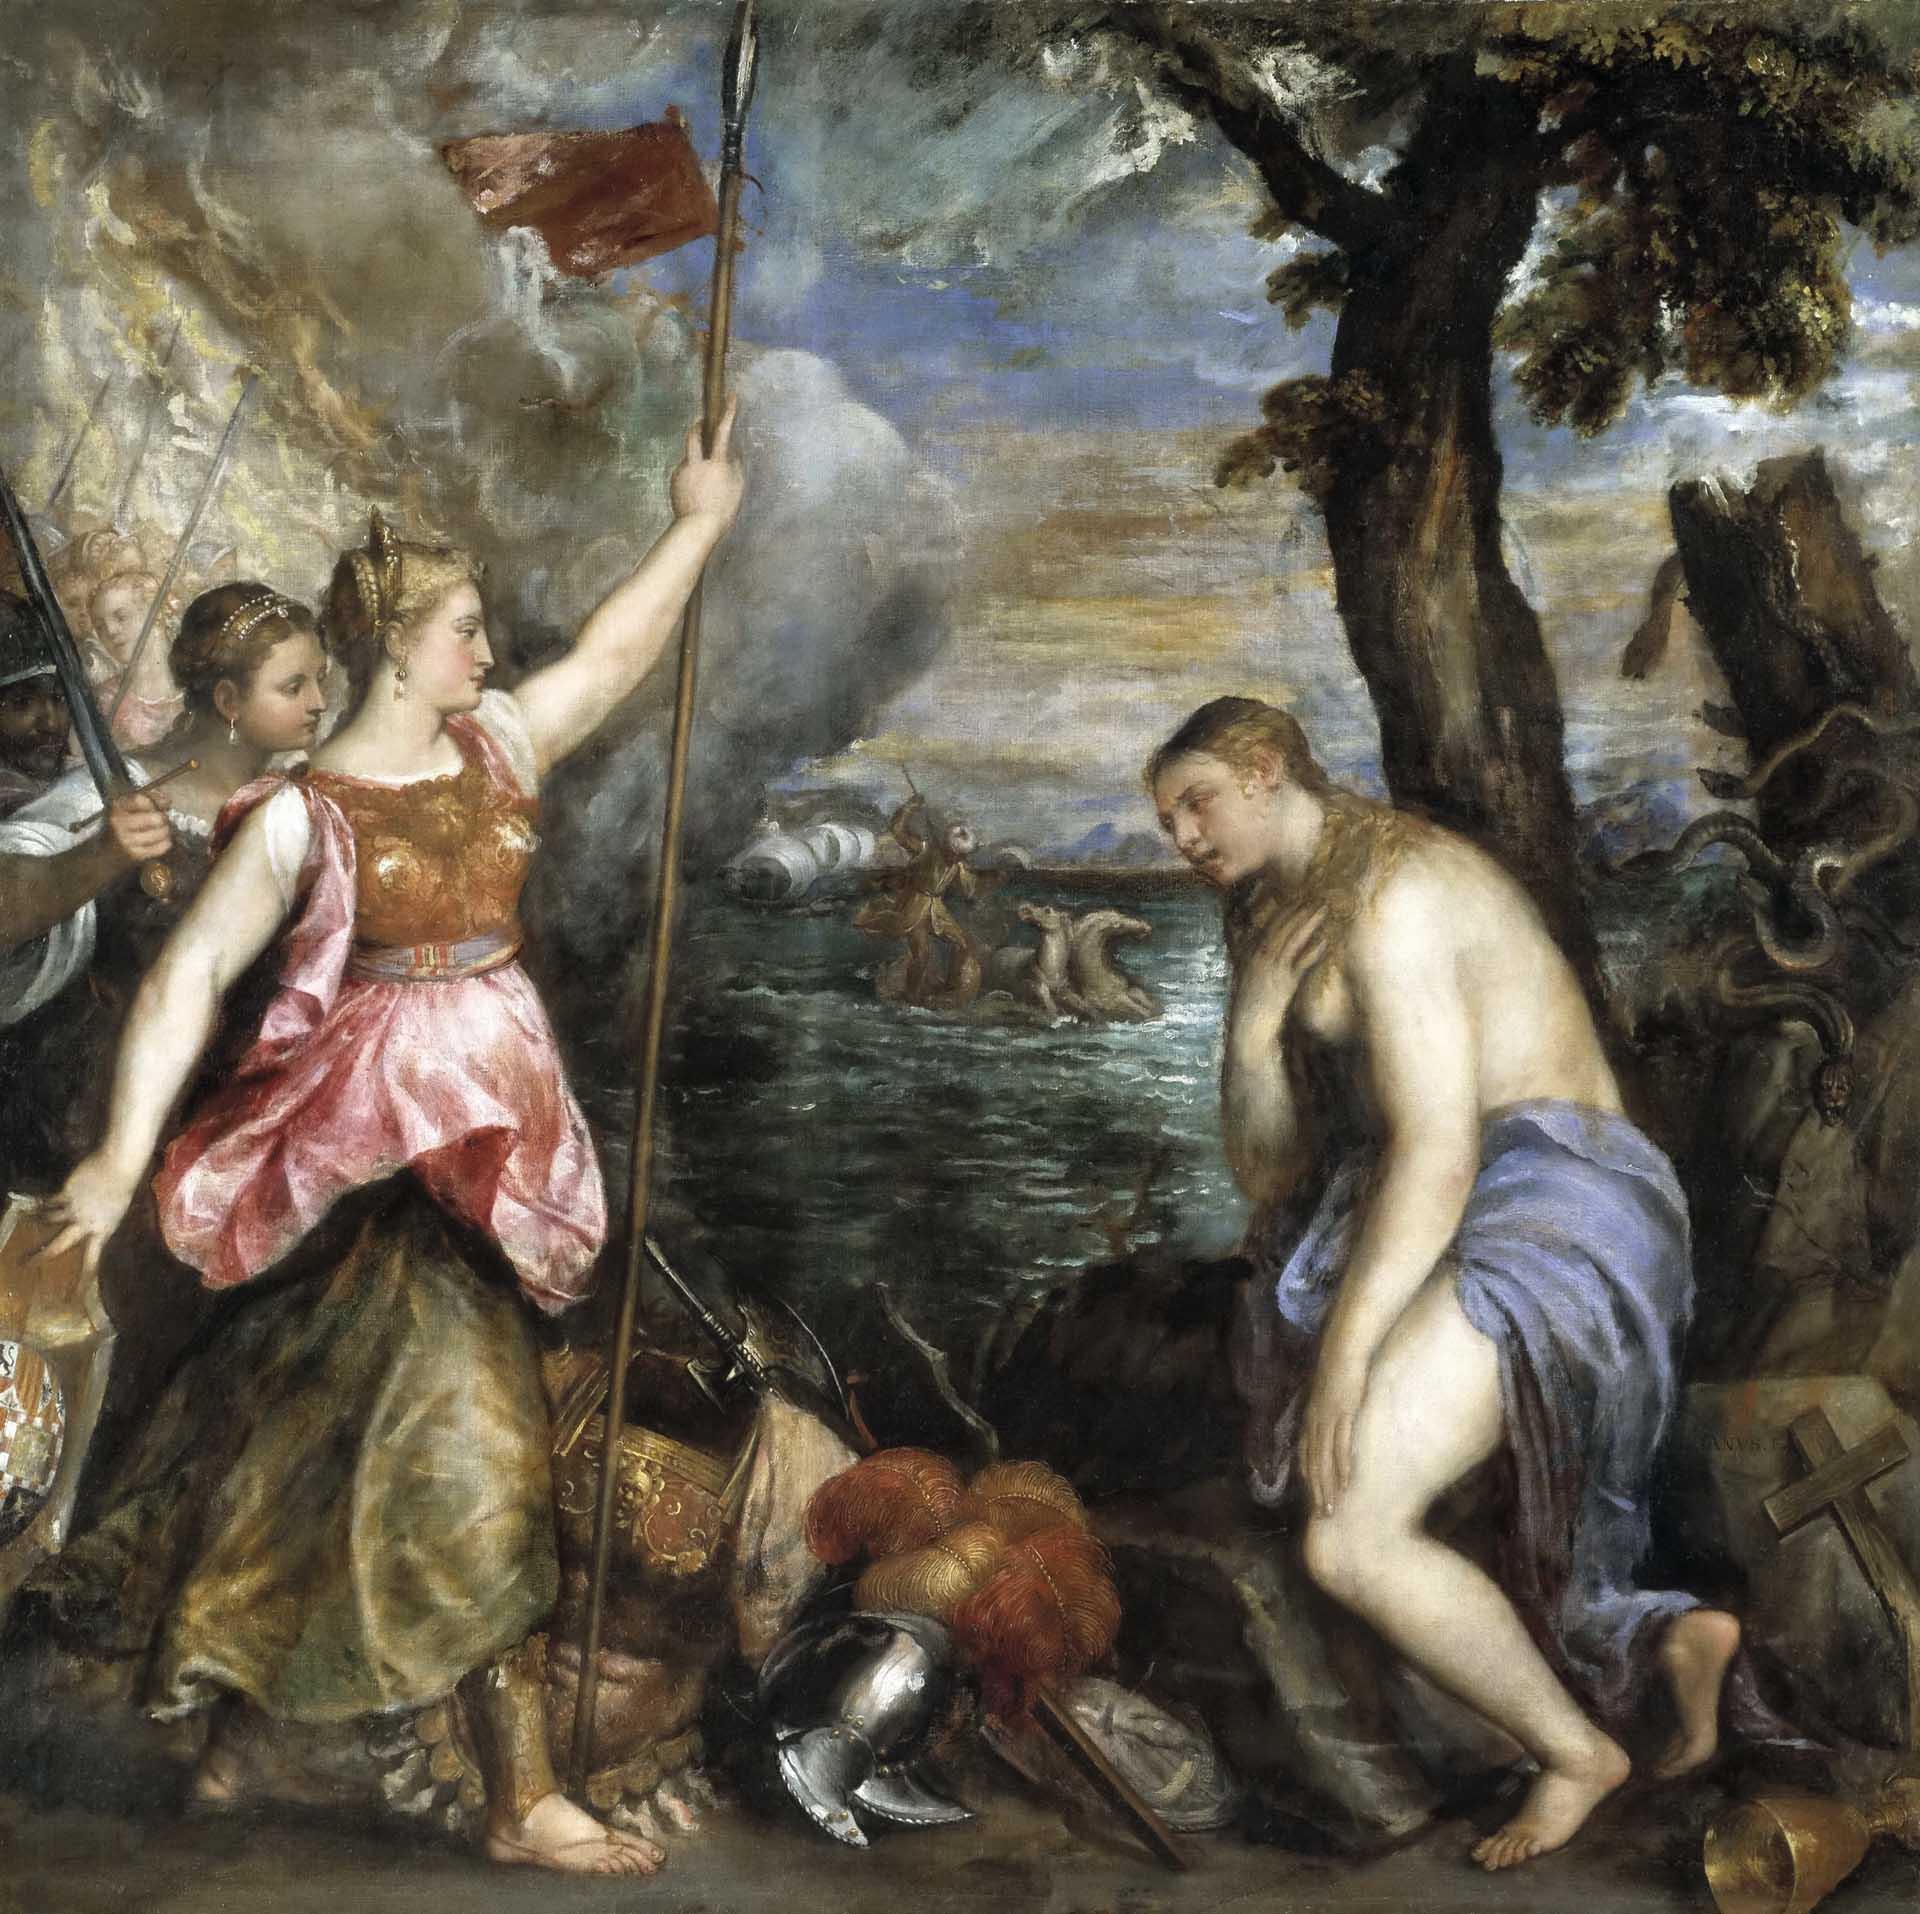 Тициан Вечеллио (Tiziano Vecellio), Аллегория Войны и Религии